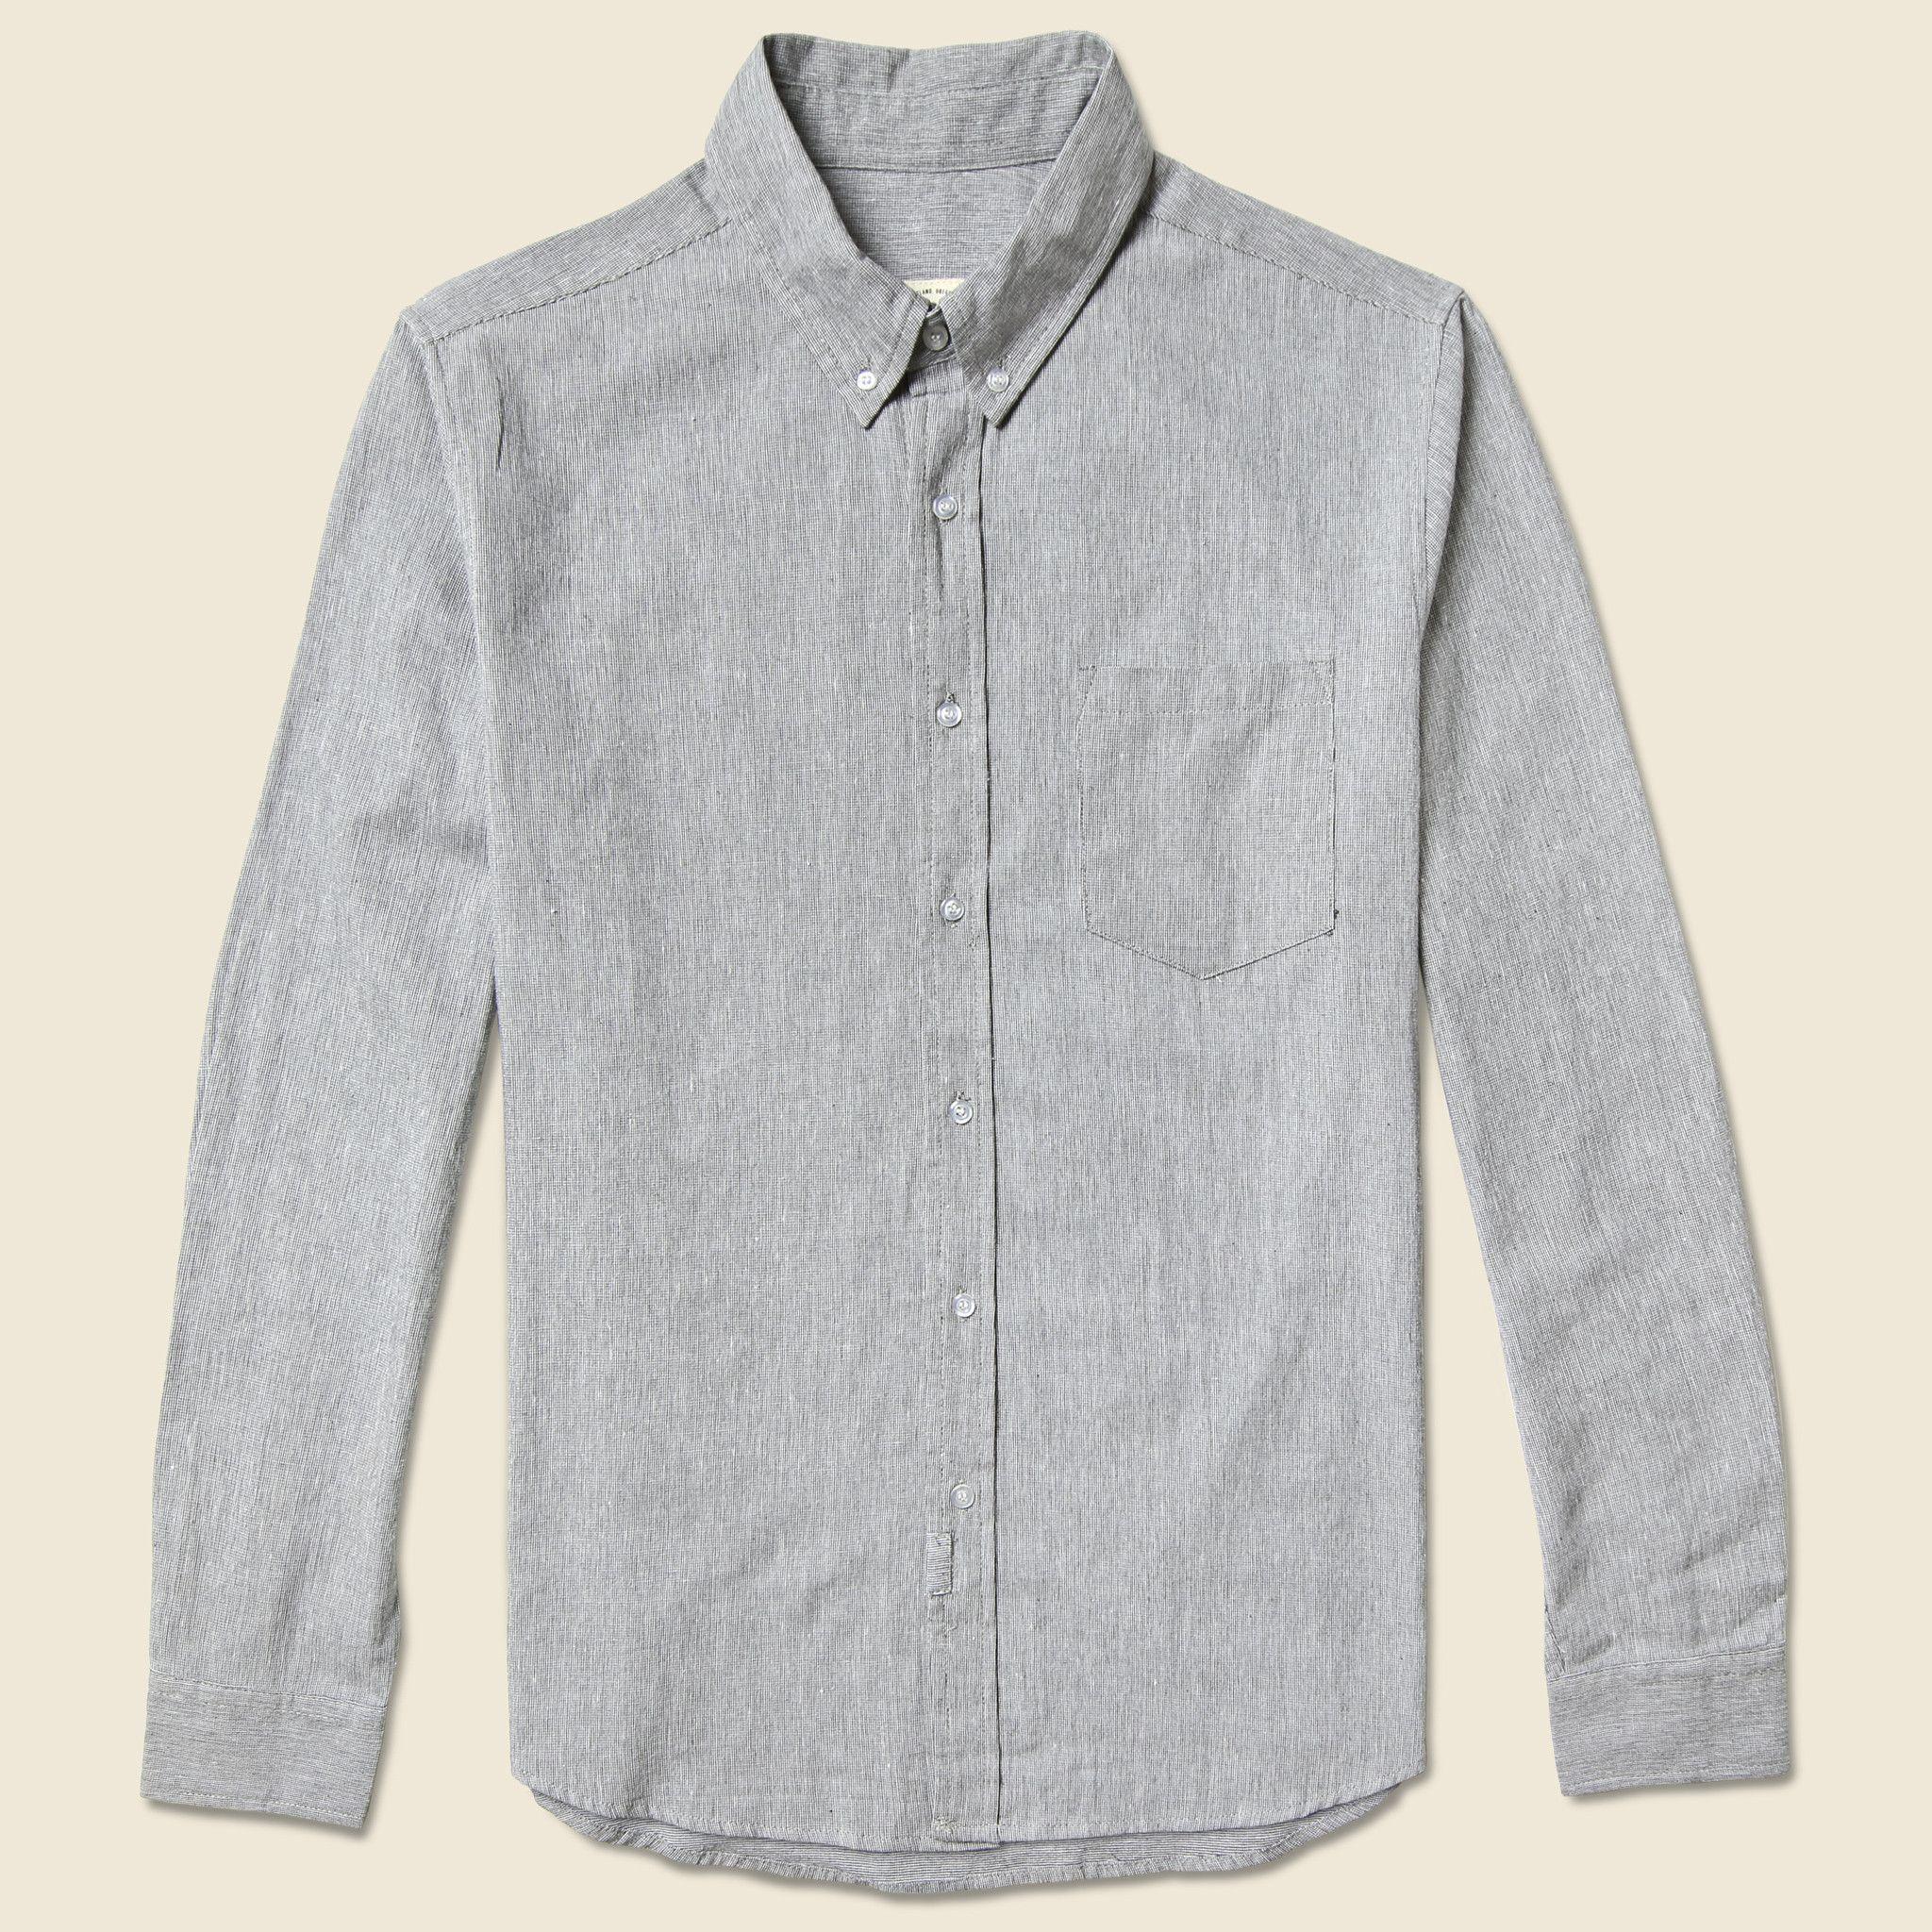 Endeavor flannel shirt  Fulton Linen Pinstripe Shirt  Grey  Products  Pinterest  Fulton